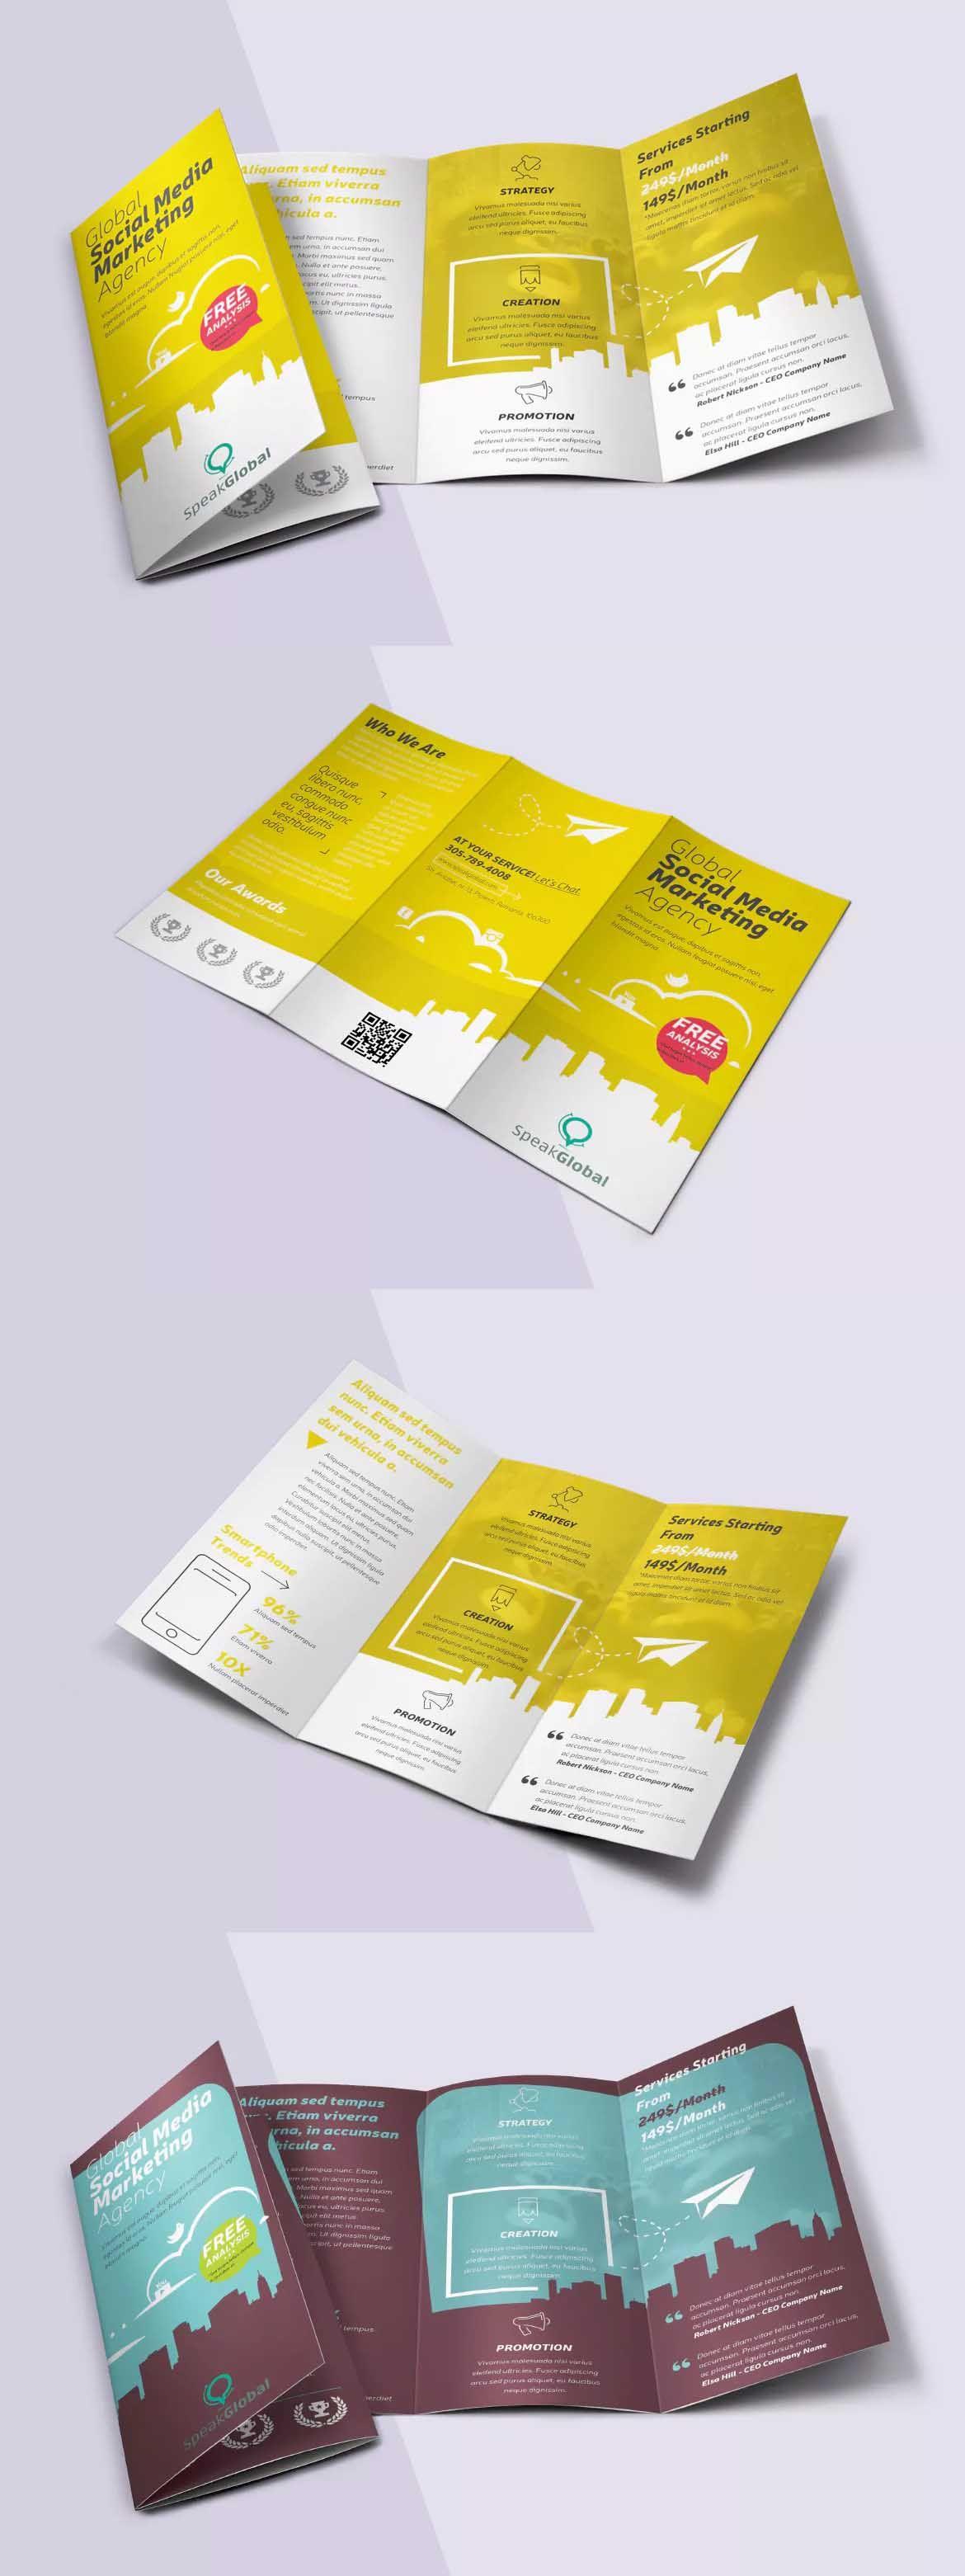 Social Media Trifold Brochure Template PSD A And US Letter - A4 tri fold brochure template